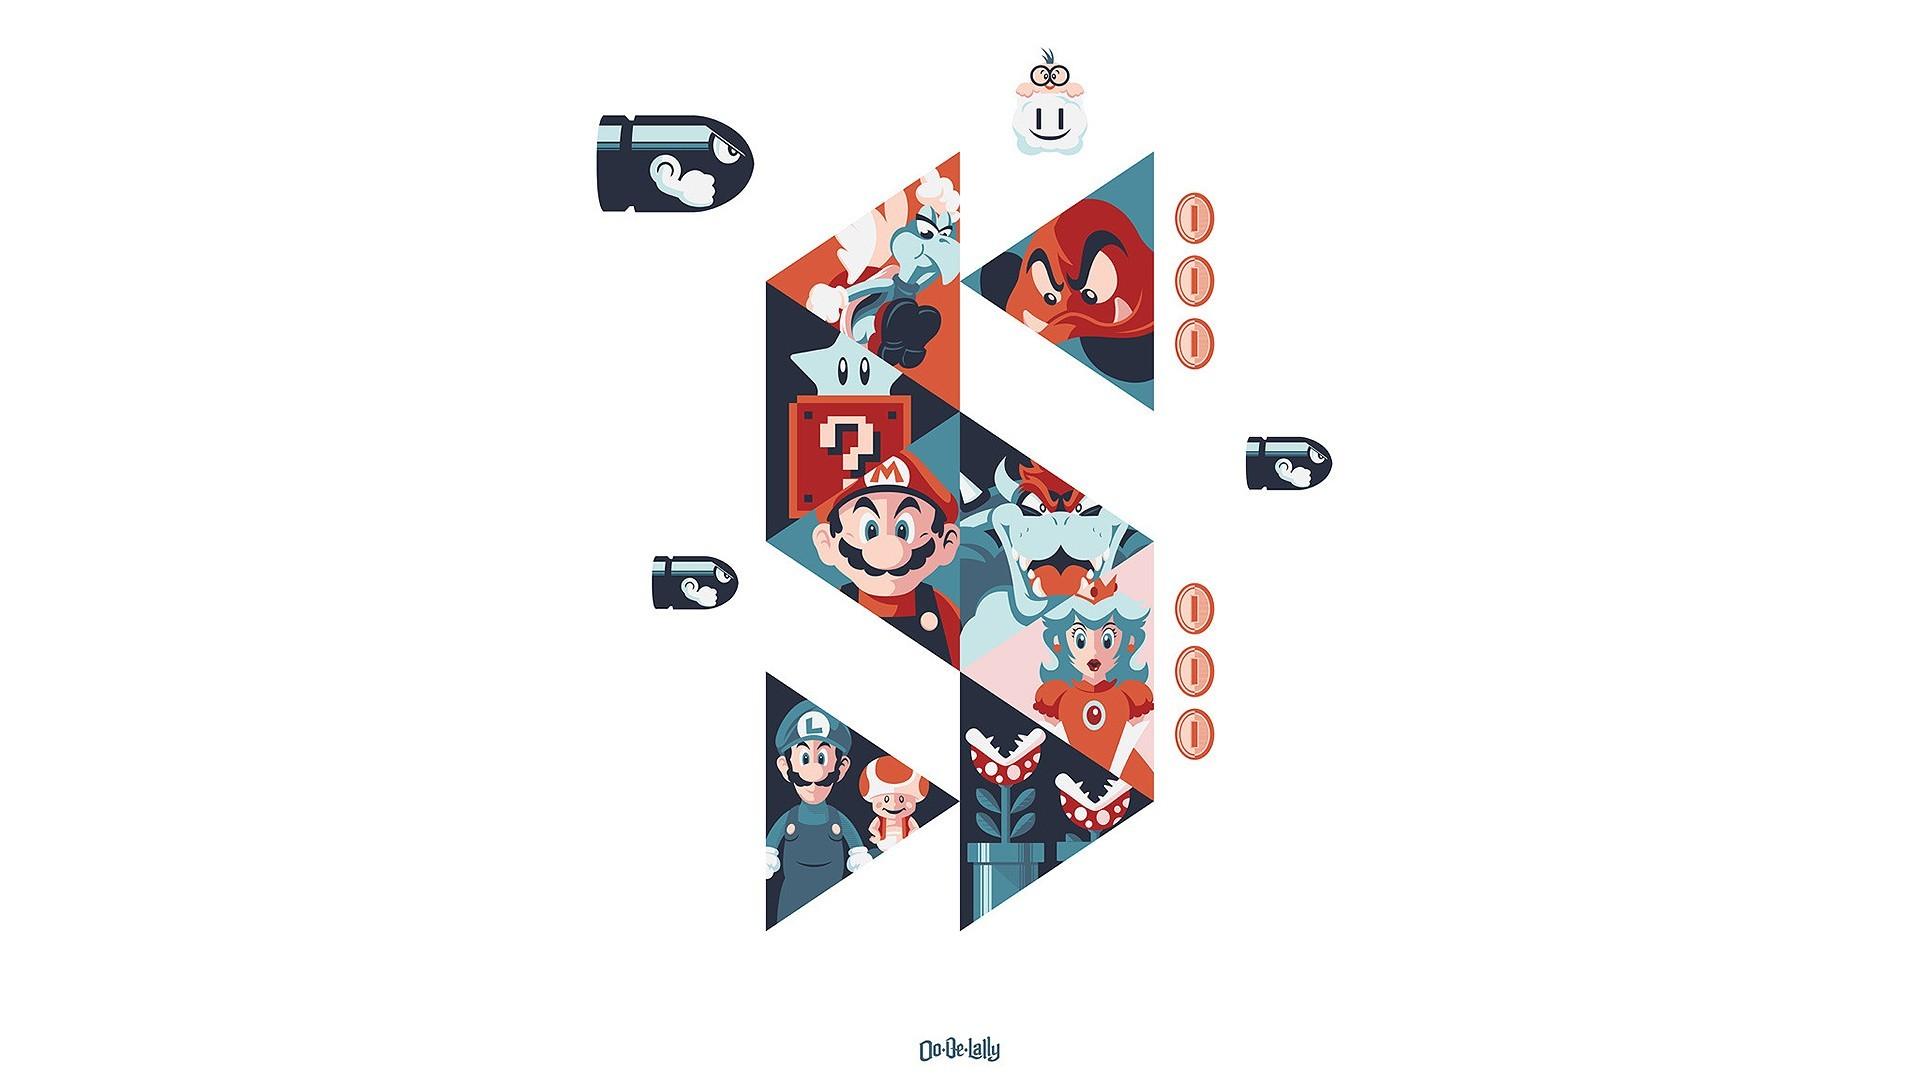 Mario Kart 8 Wallpaper Hd Nintendo Wallpaper 84 Immagini